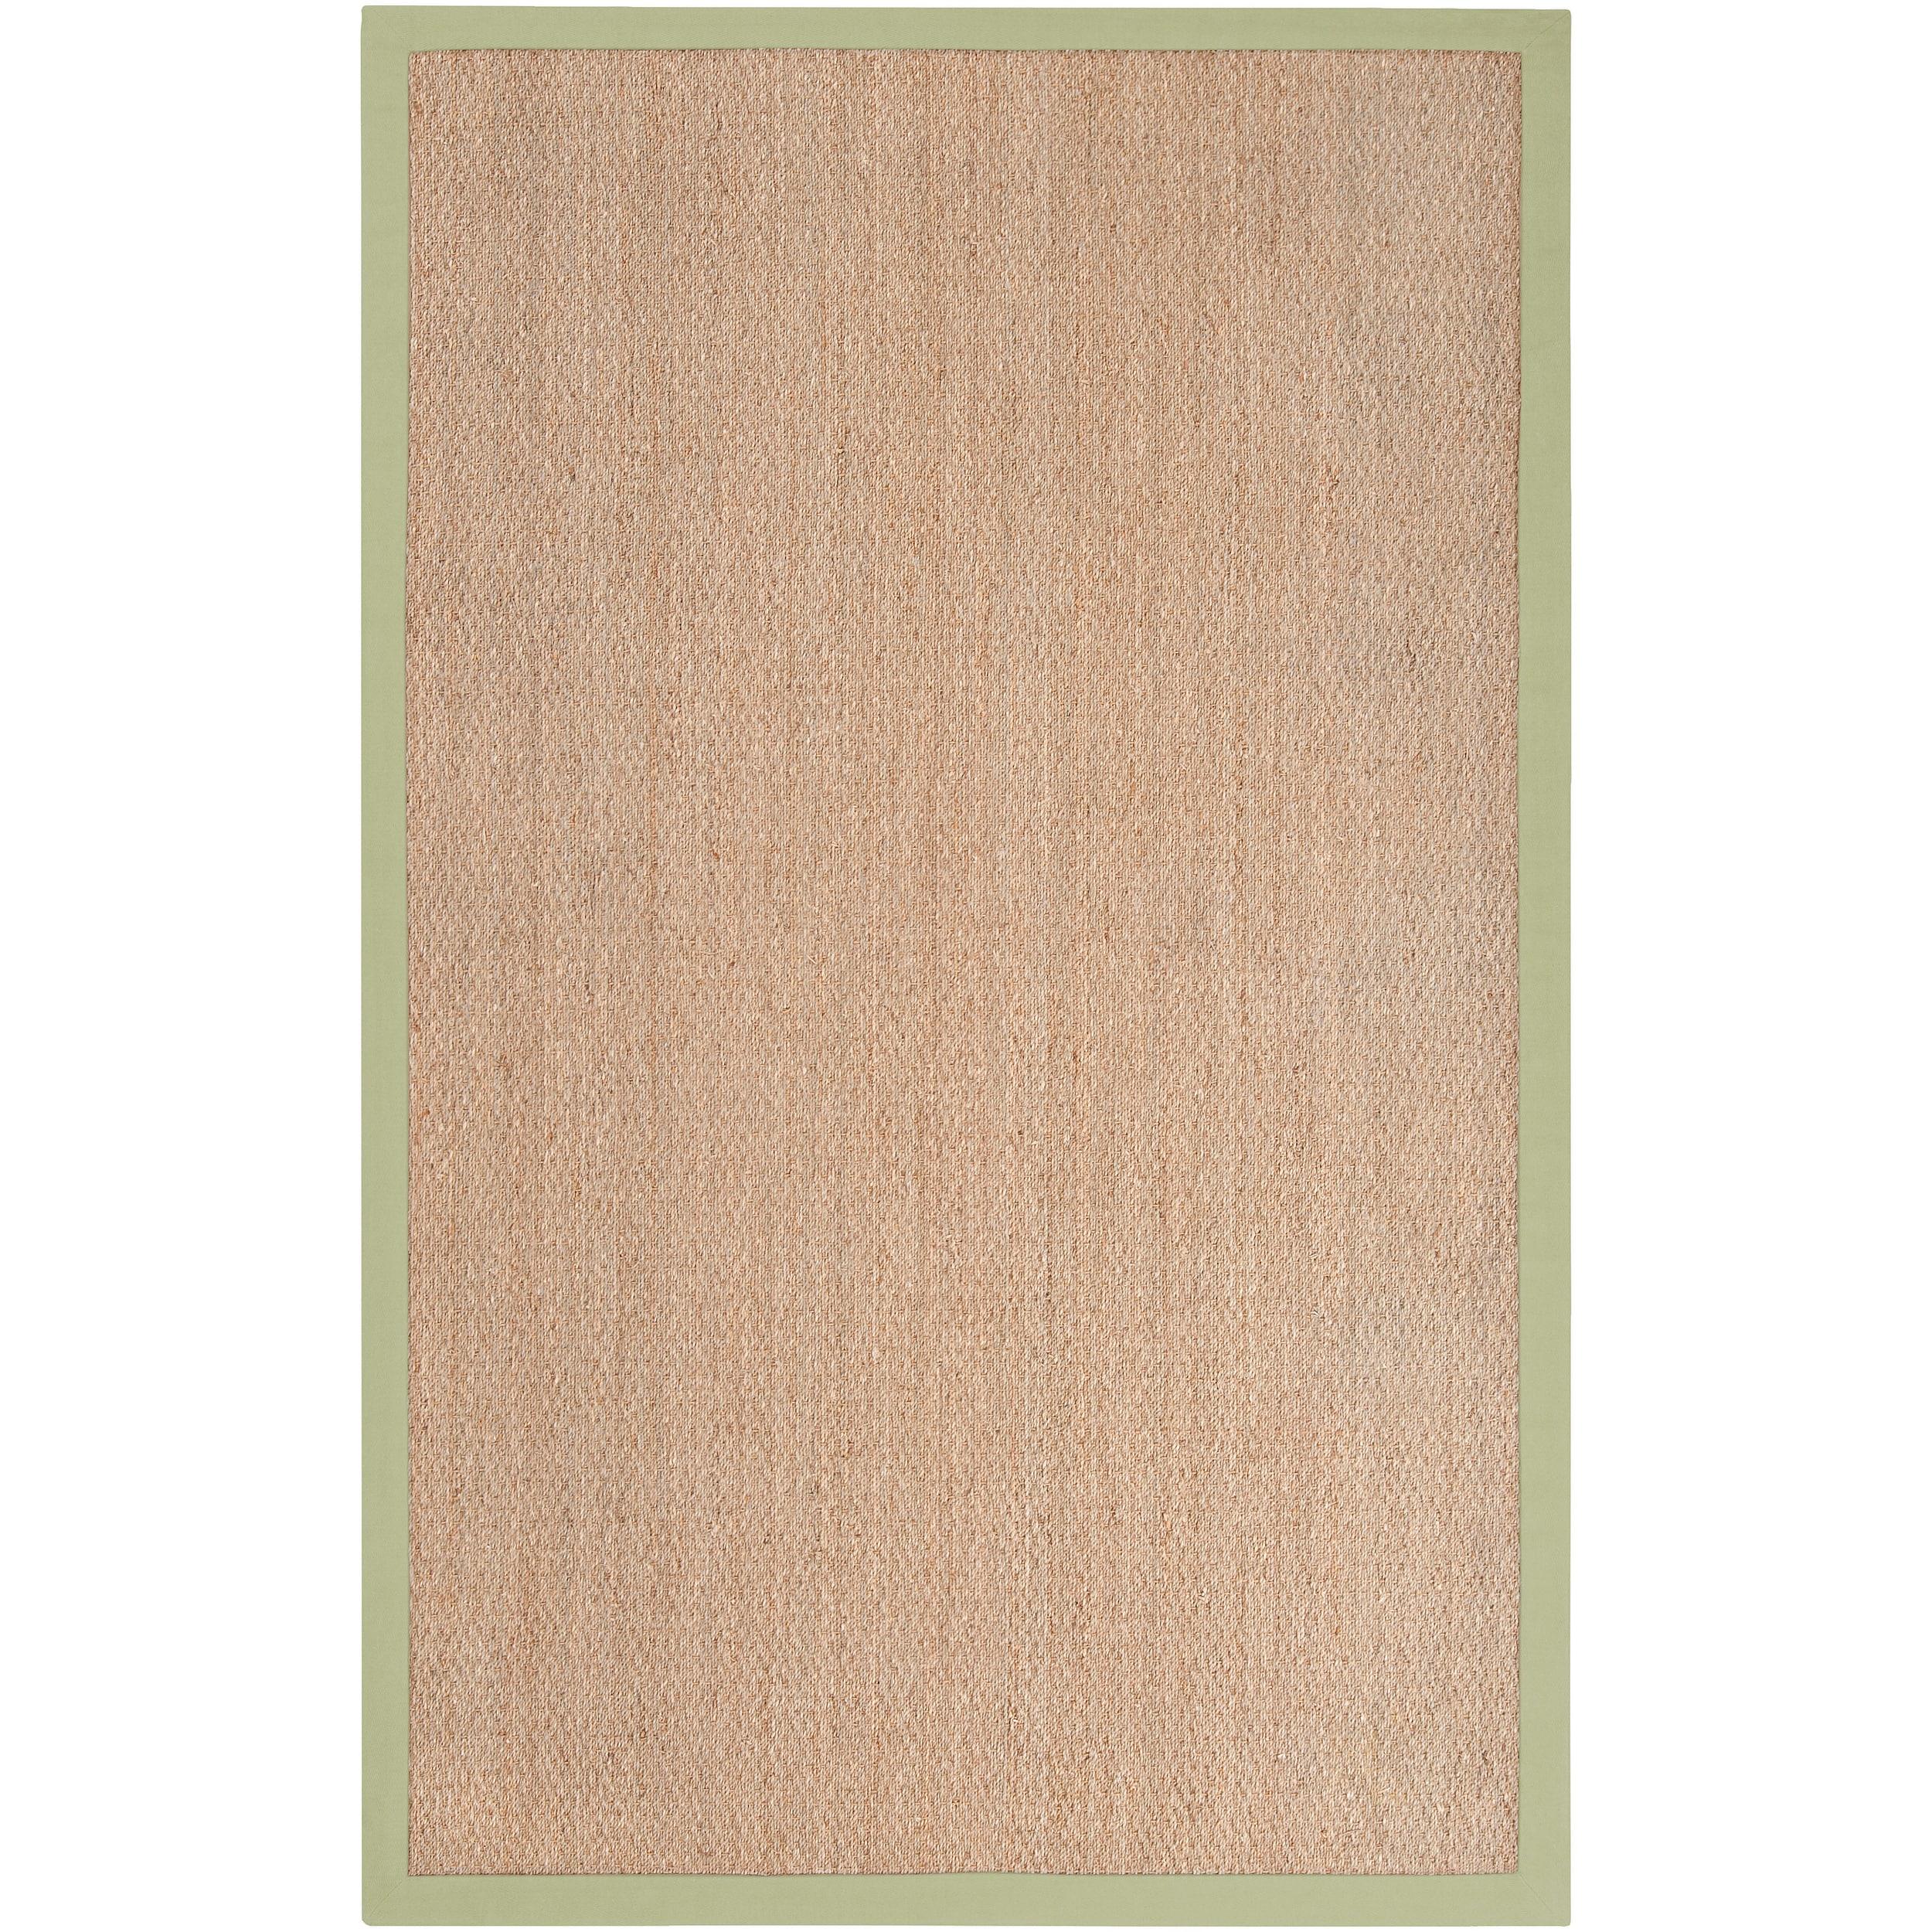 Hand-woven Green Pursuit Natural Fiber Seagrass Cotton Border Rug (9' x 13')